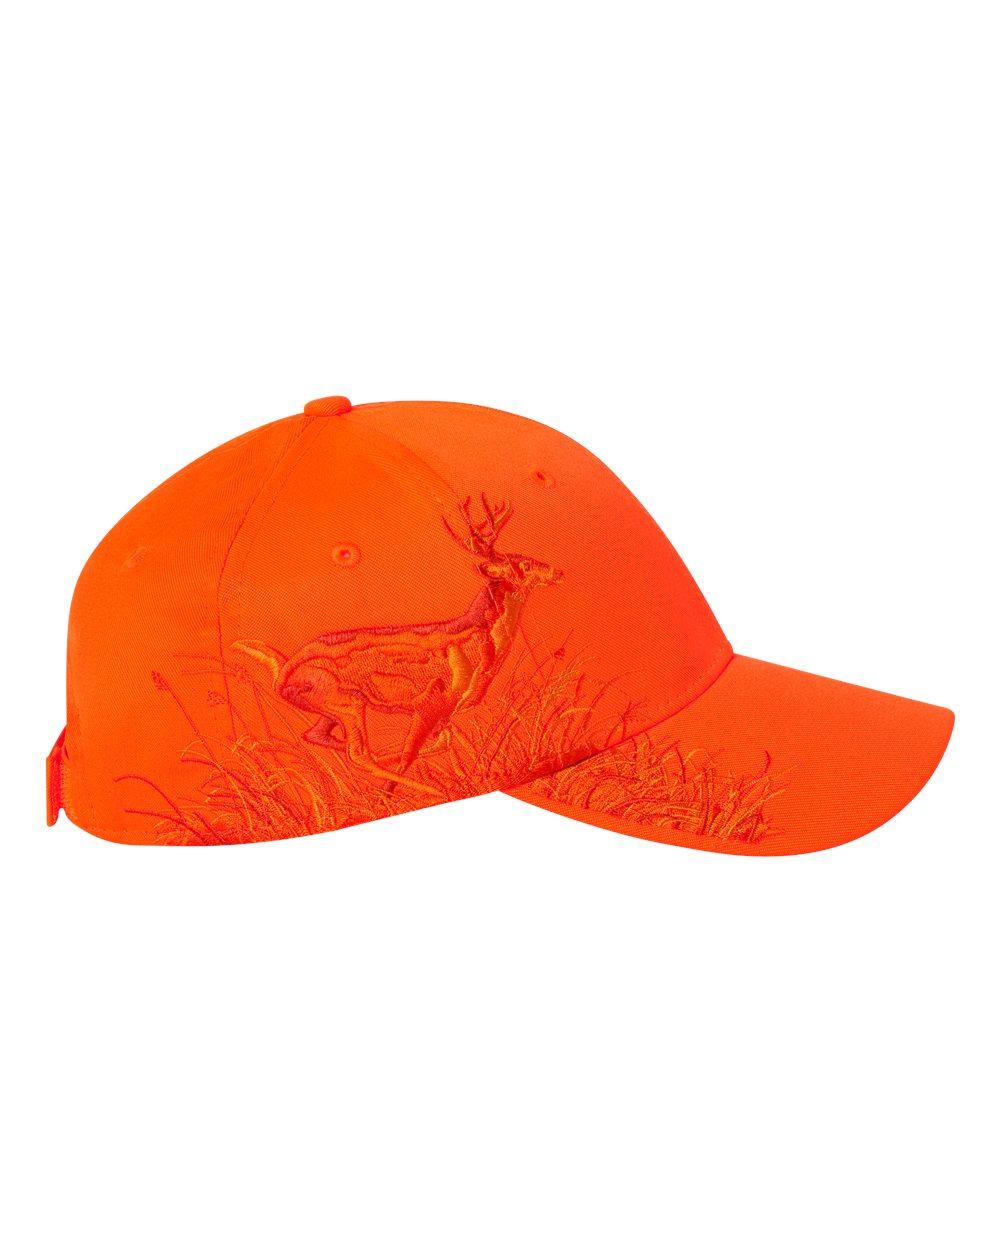 click to view Blaze Orange-Buck